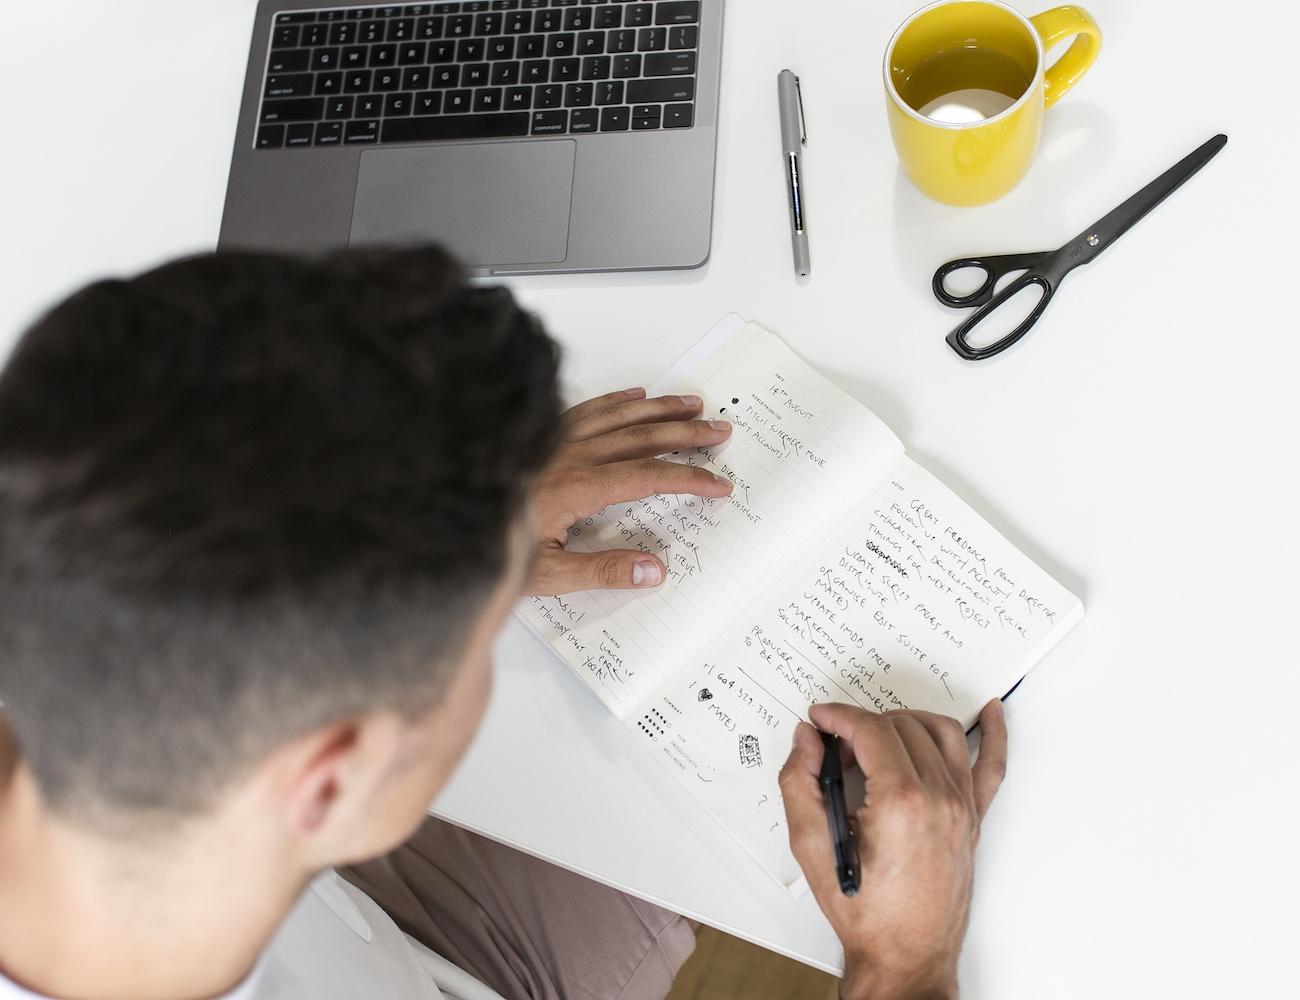 The Focus Journal Task-Based Organizer